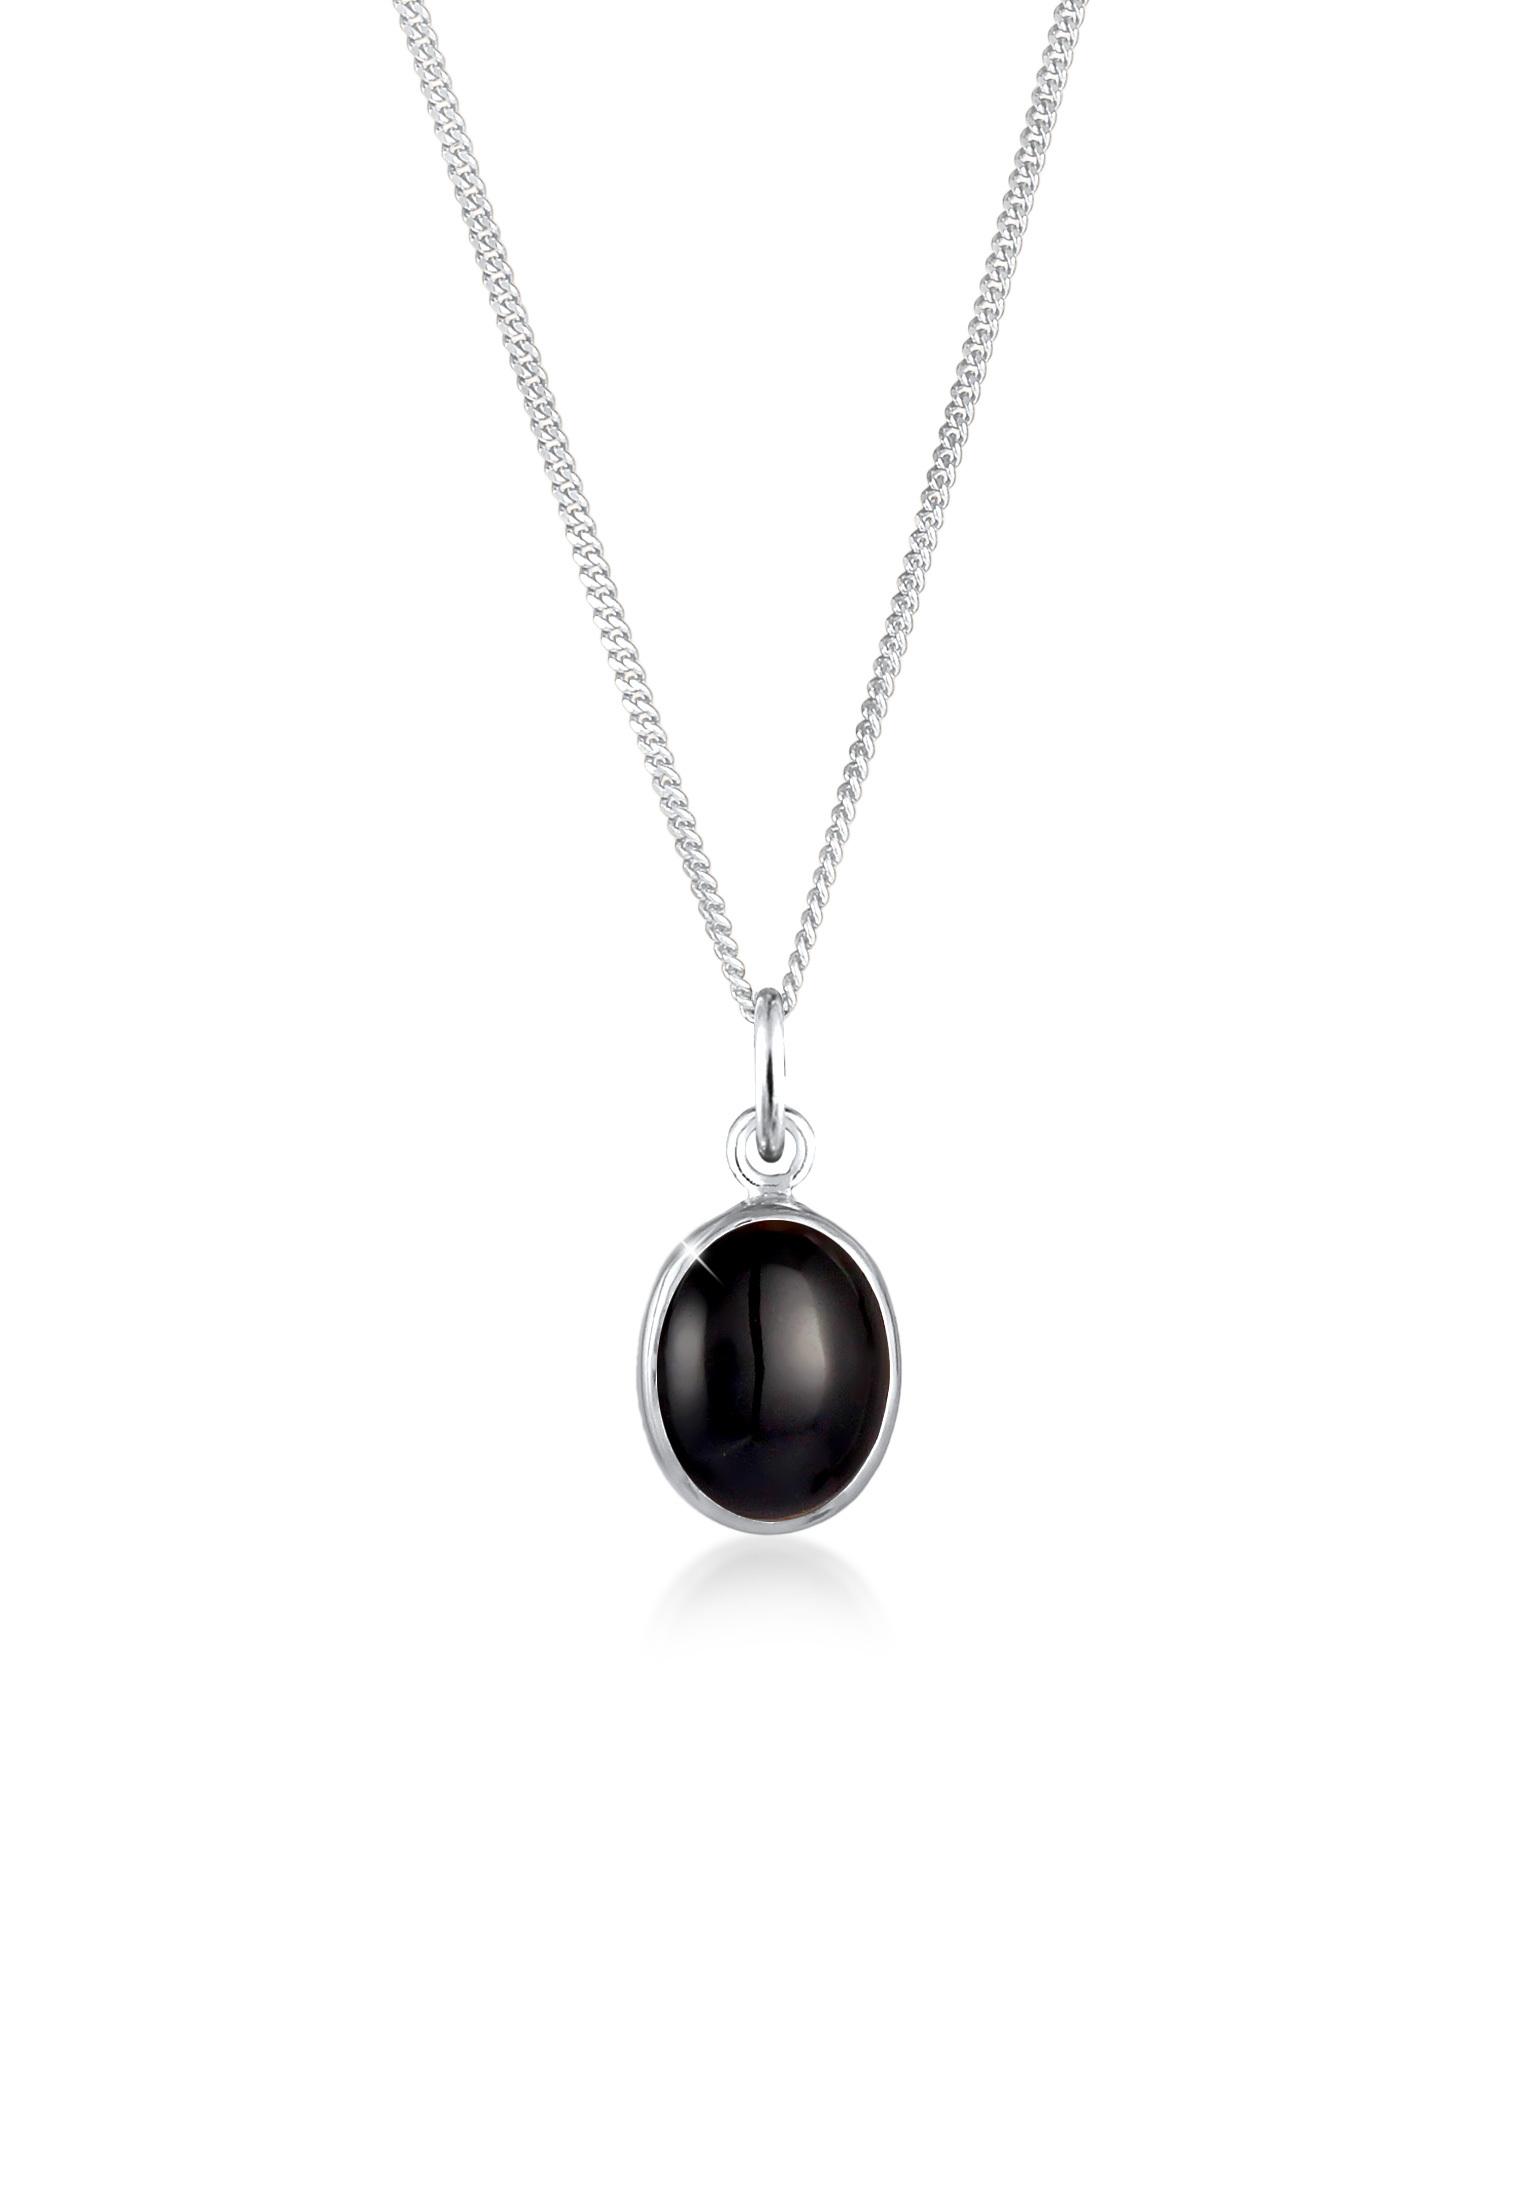 Halskette   Onyx ( Schwarz )   925er Sterling Silber